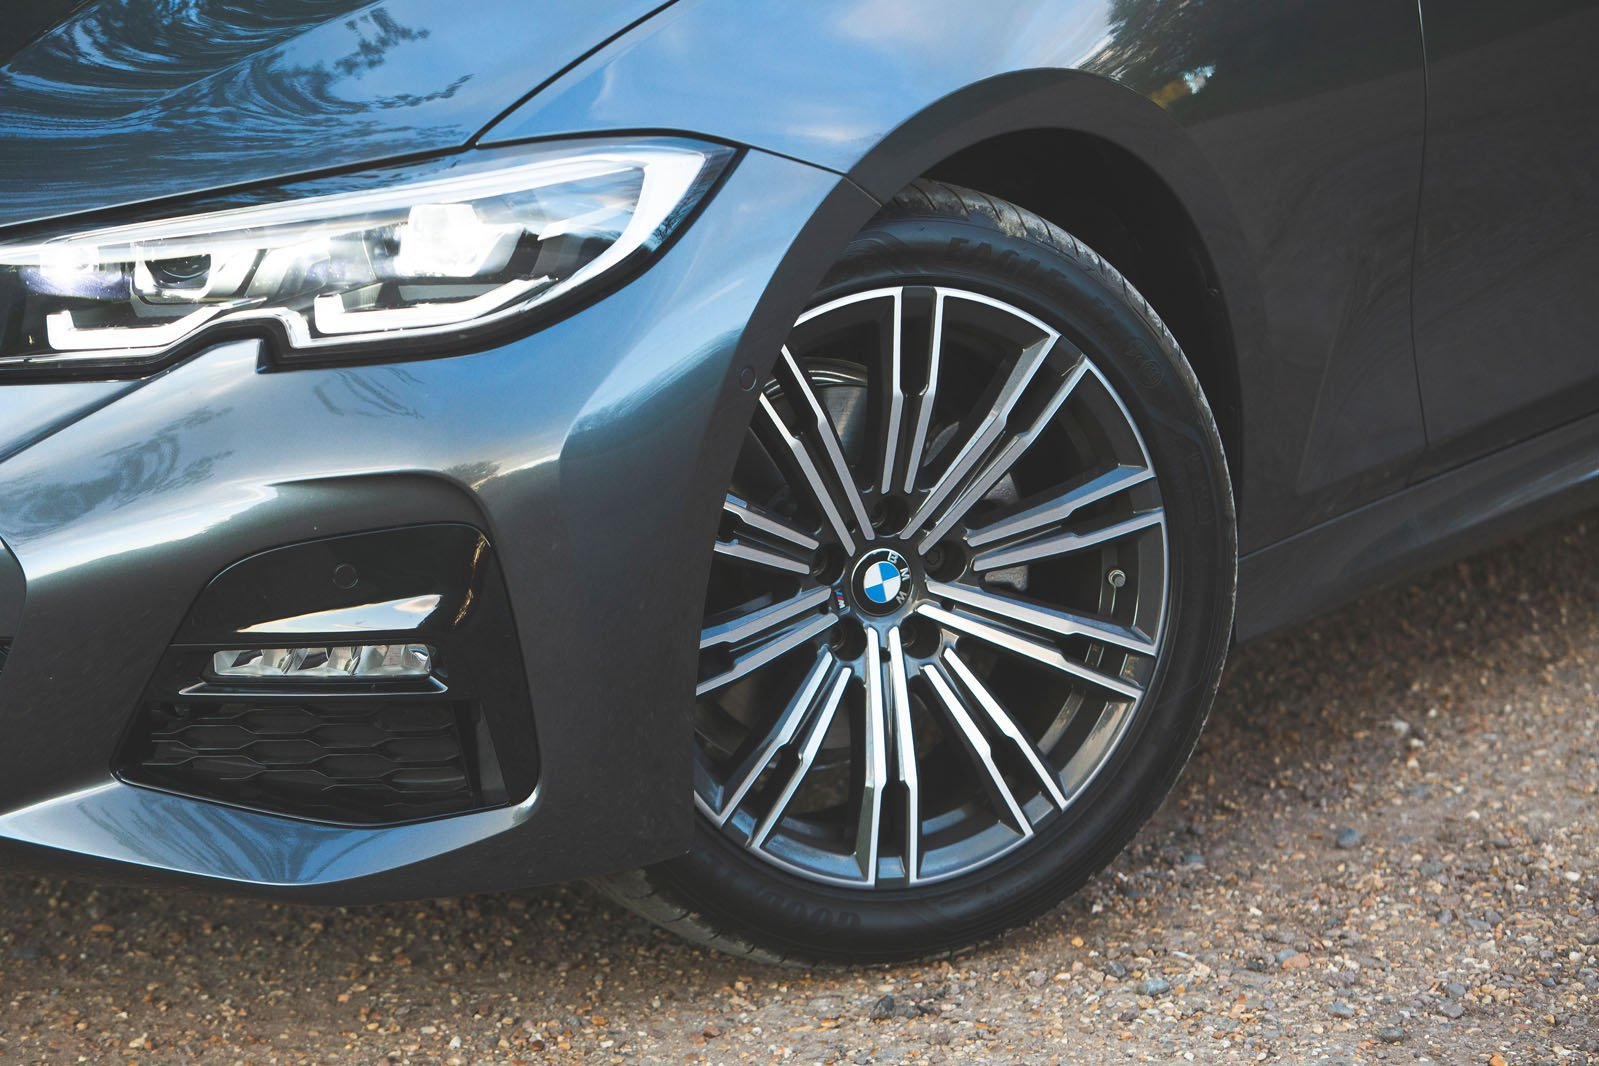 BMW 3 Series Interior, Sat Nav, Dashboard | What Car?